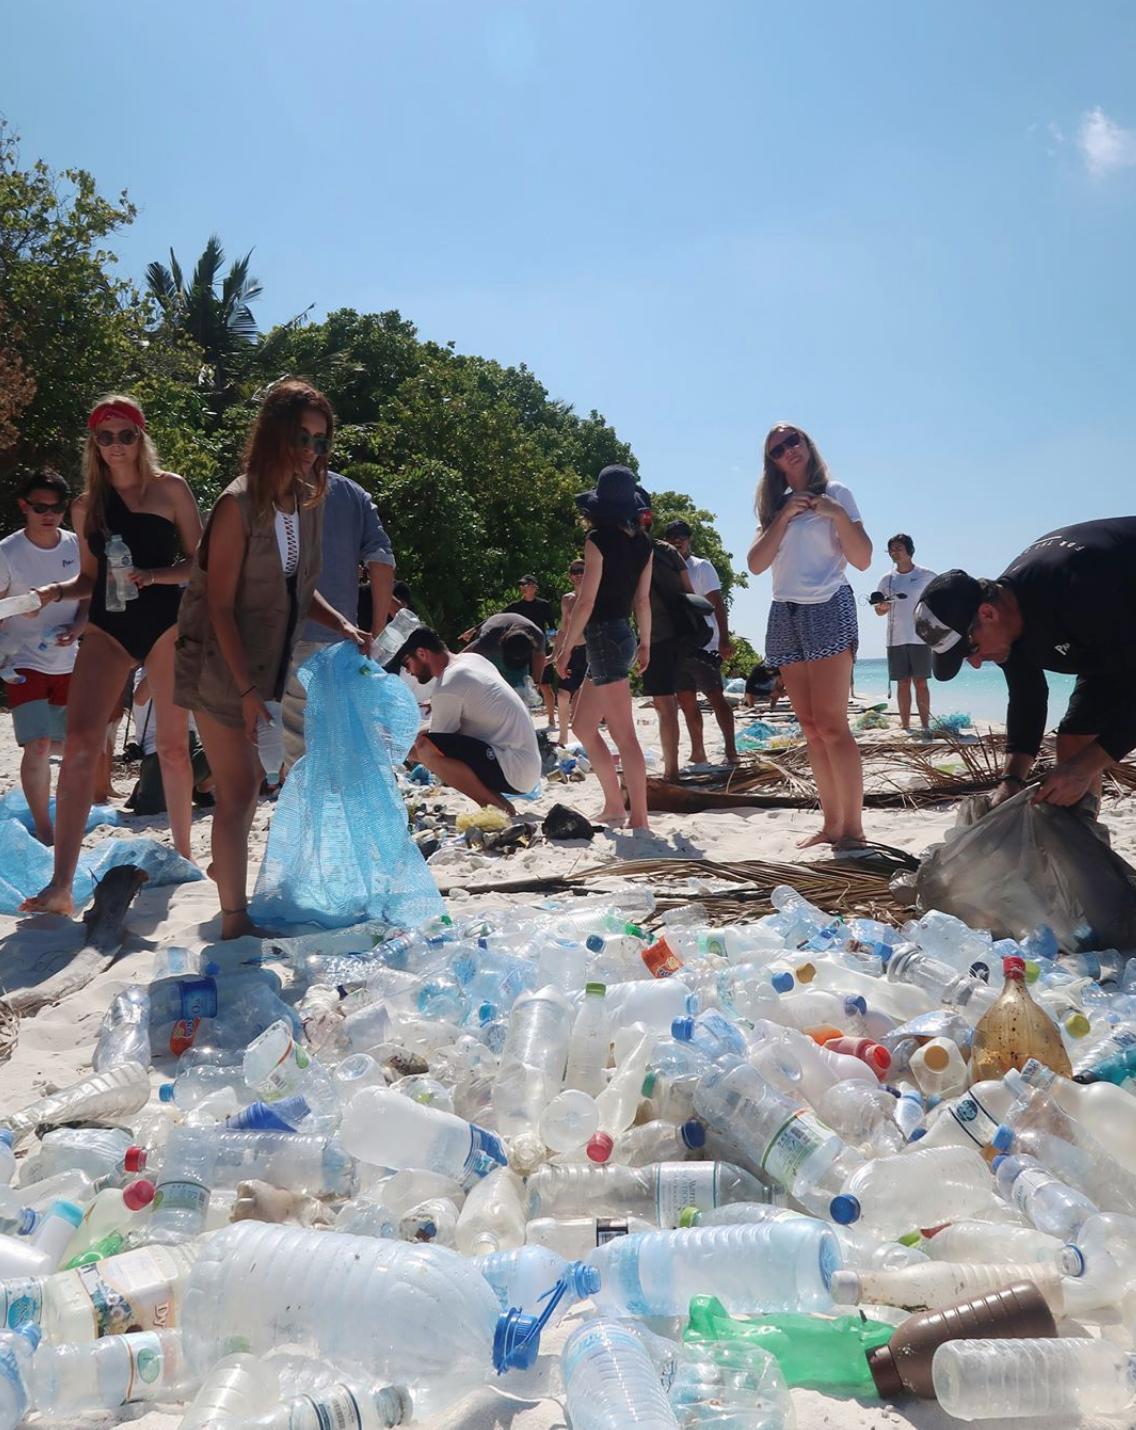 people handling plastic bottles waste on a beach